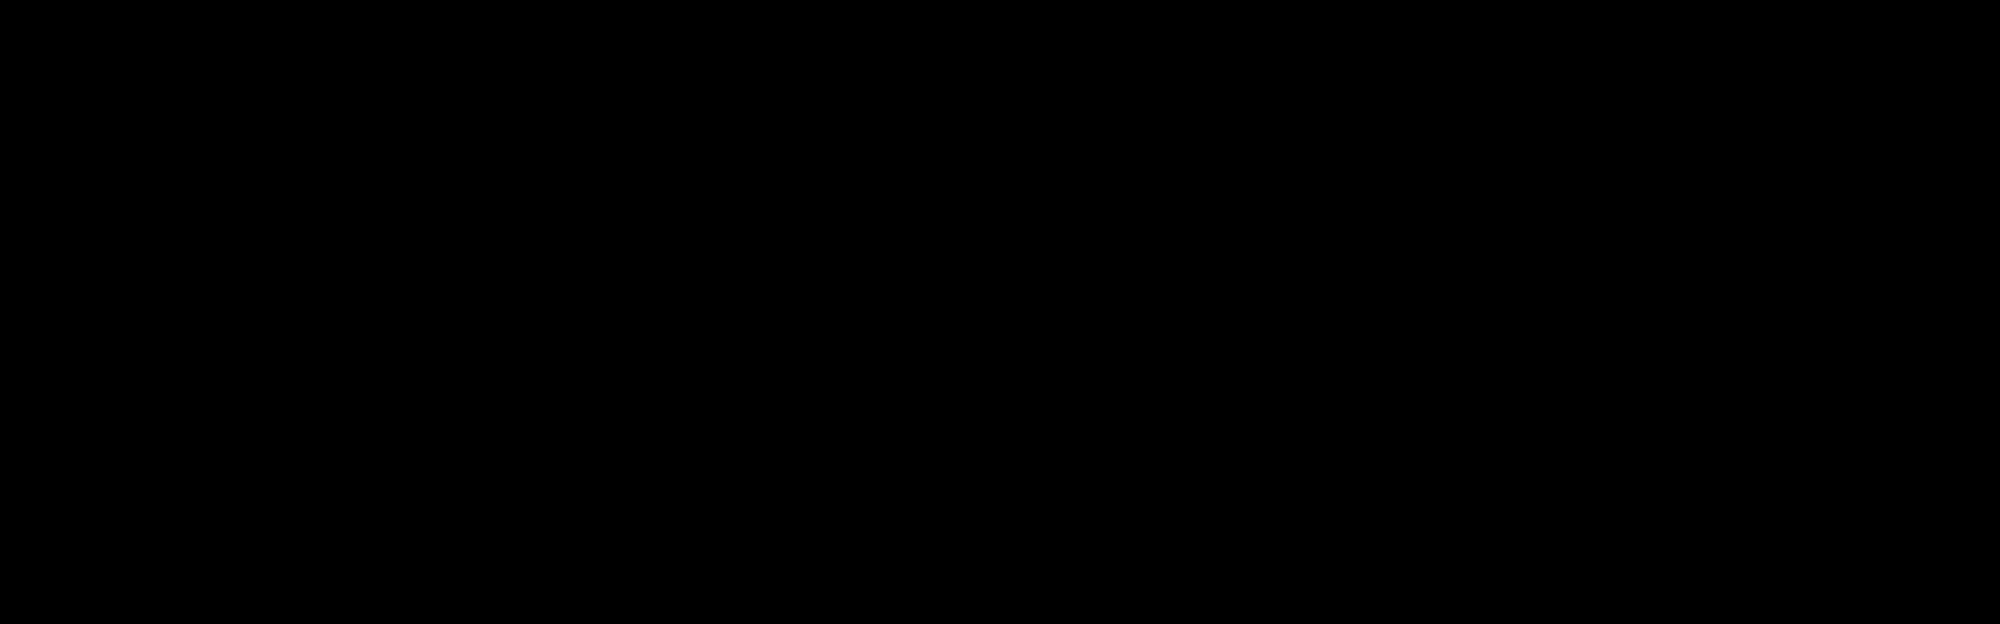 umbridge-for-ttt